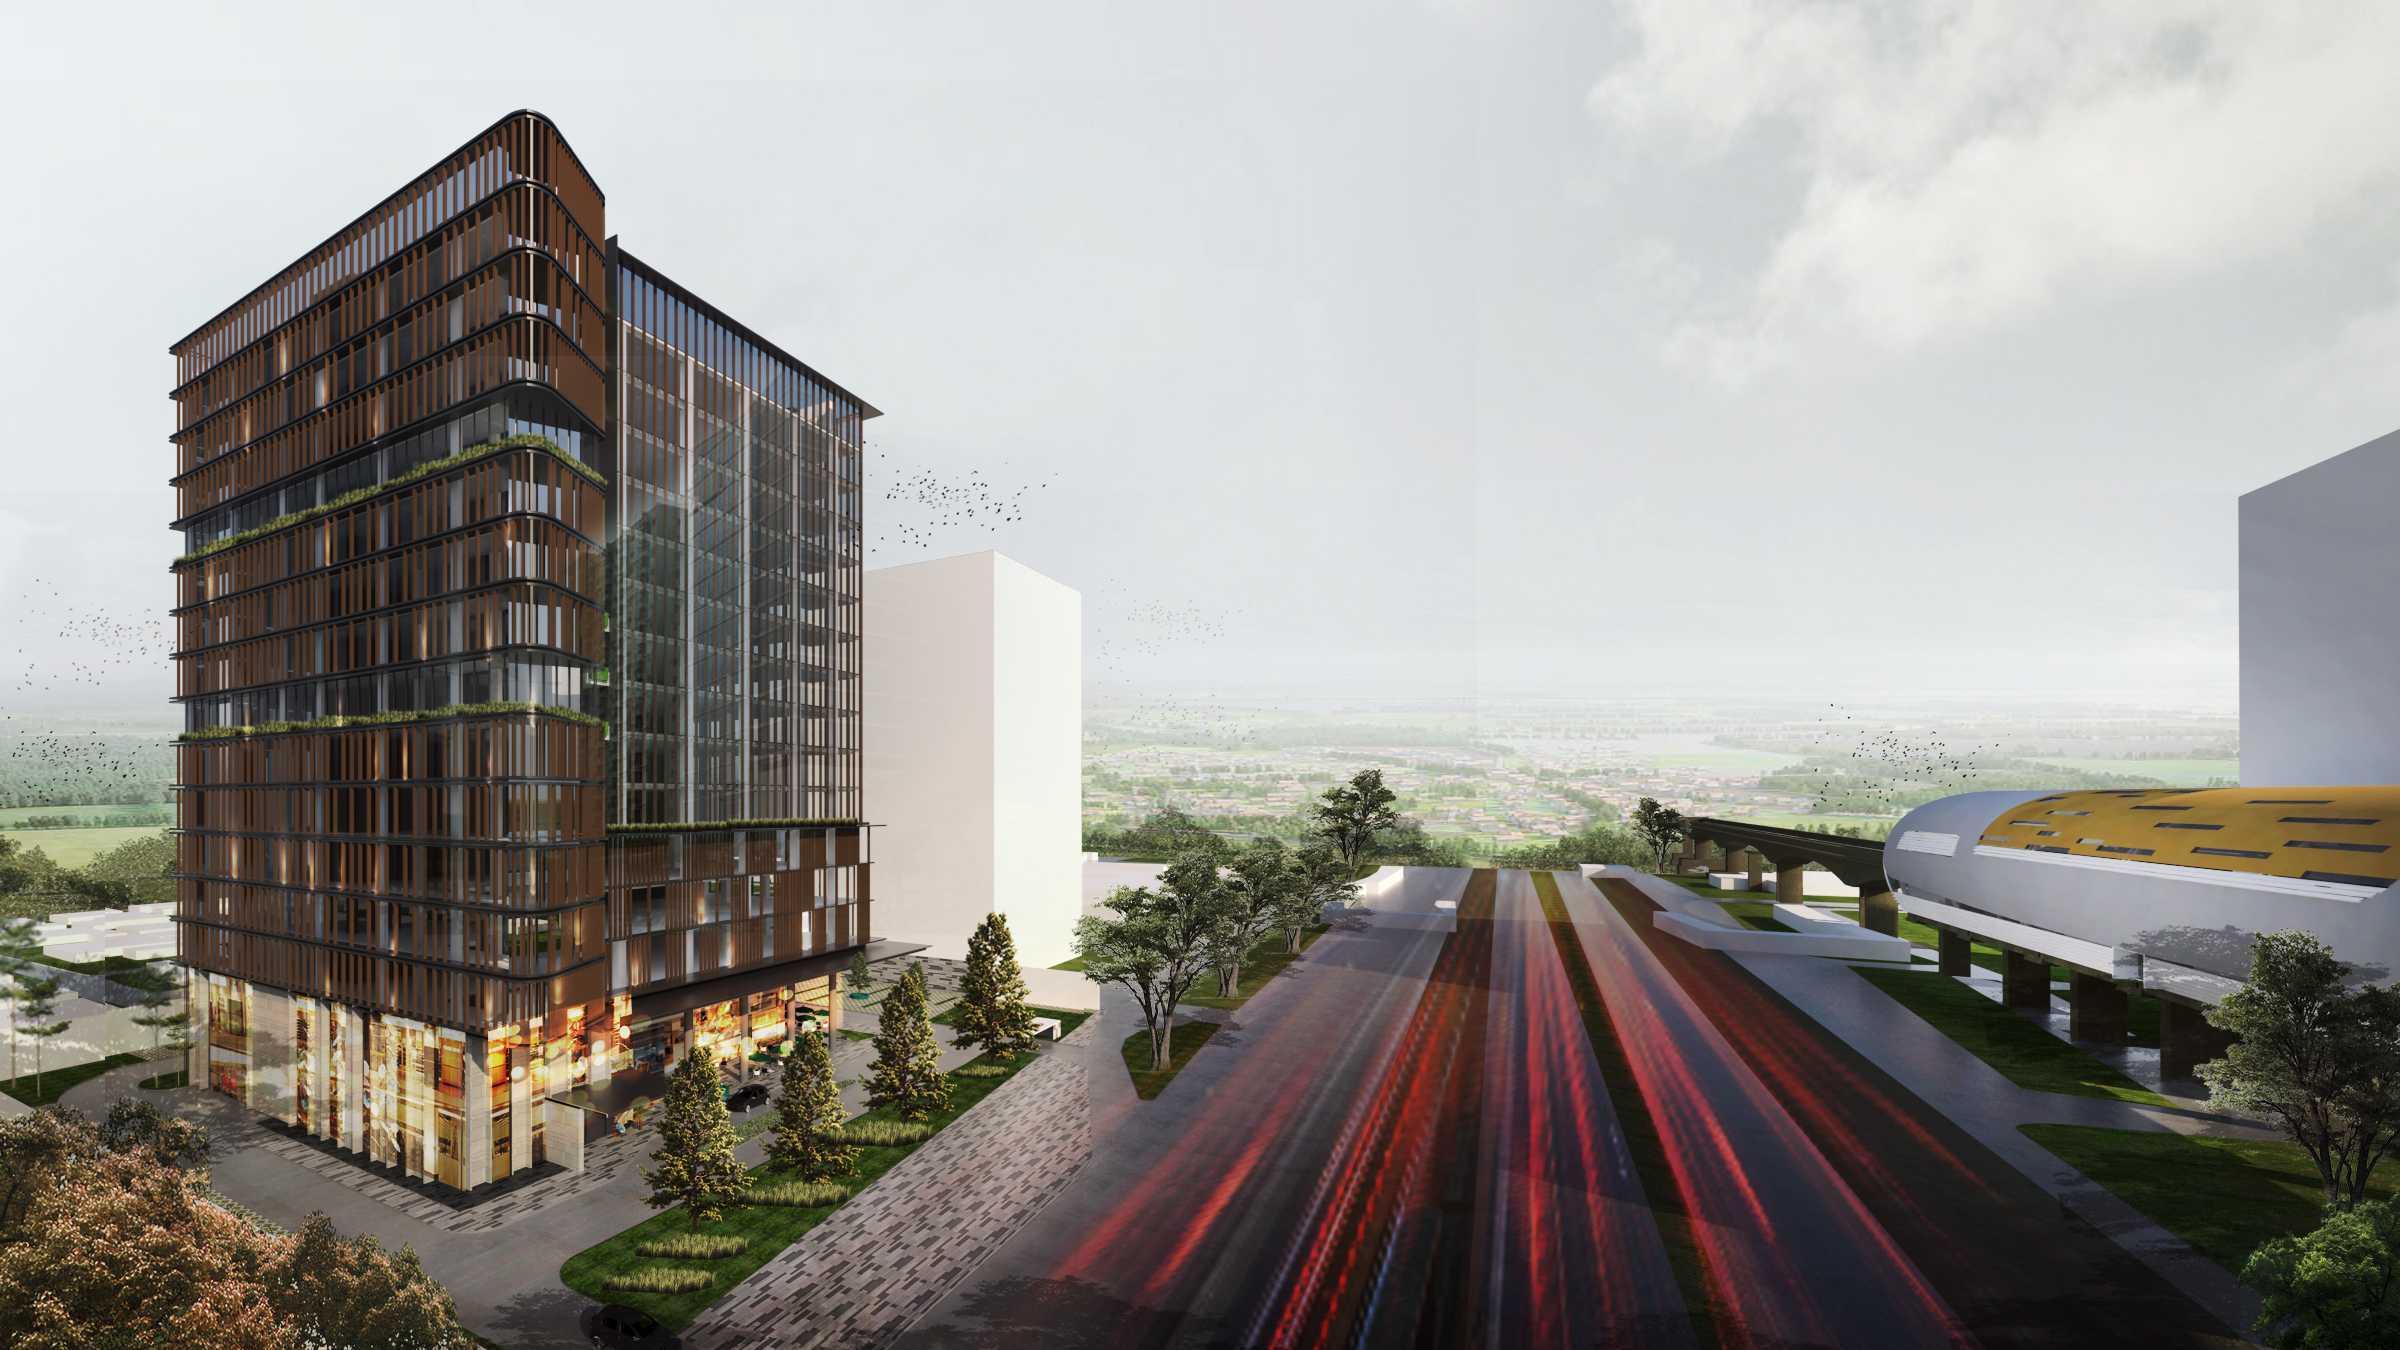 "Moi Architects Mt Office ""the Urban Canopy"" Jakarta, Daerah Khusus Ibukota Jakarta, Indonesia Jakarta, Daerah Khusus Ibukota Jakarta, Indonesia Moi-Architects-Mt-Office-The-Urban-Canopy   59031"